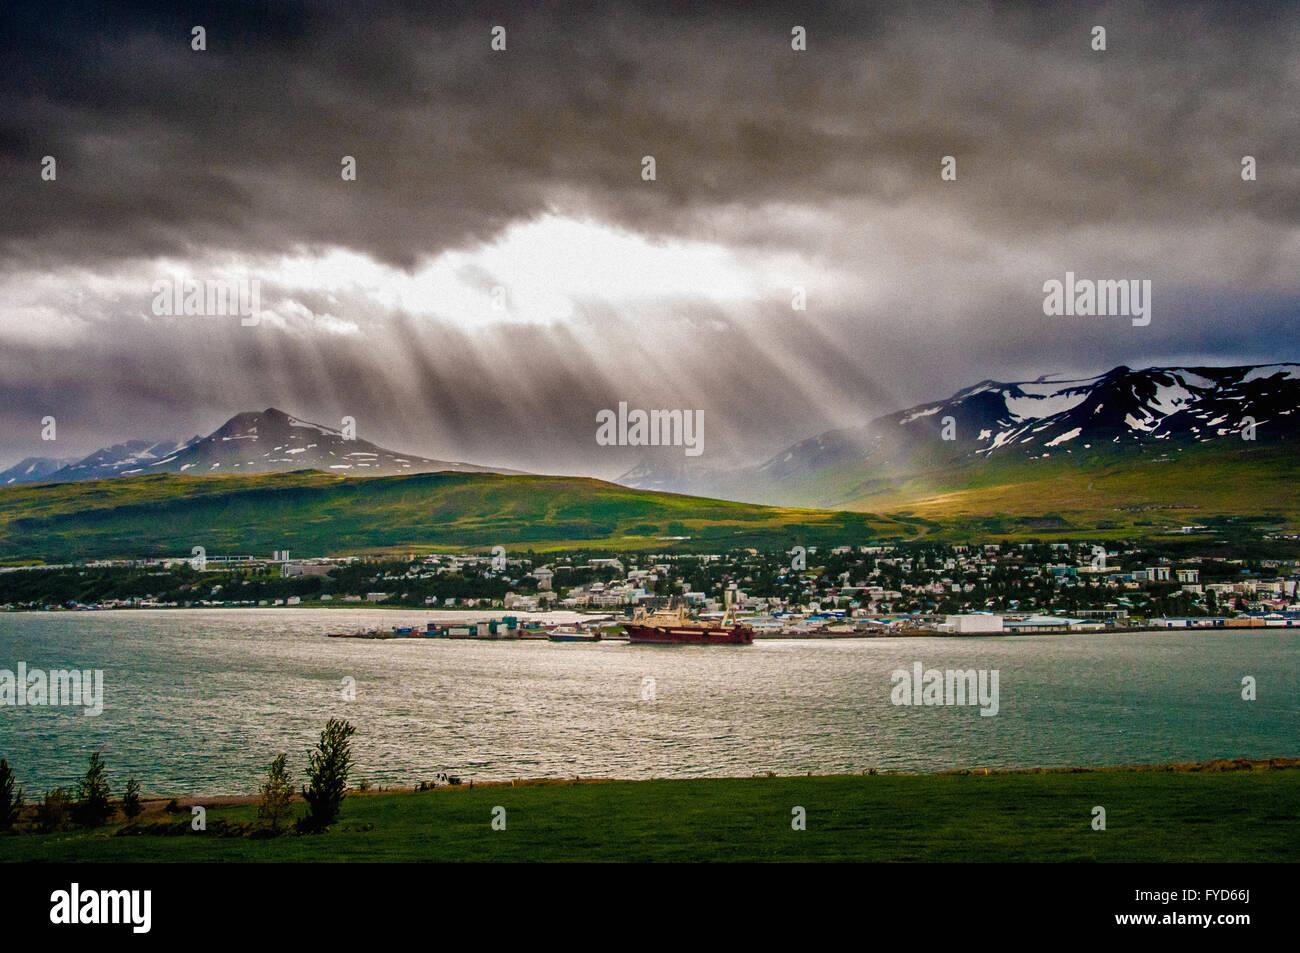 The Port of Akureyri, and Eyjafjörður - the longest fjord in Iceland. - Stock Image